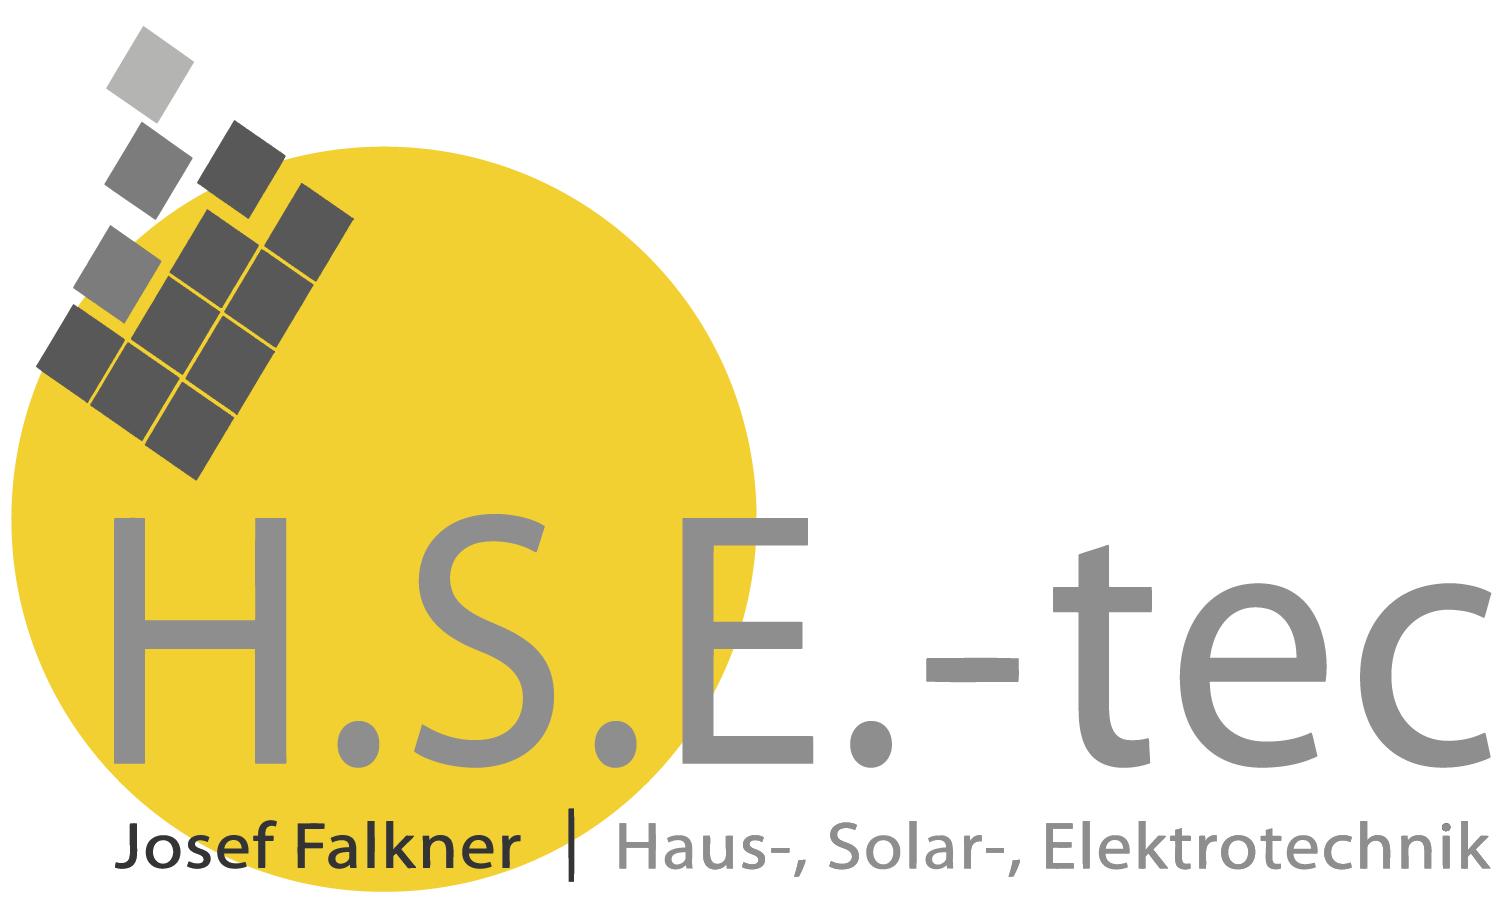 H.S.E.-tec | Josef Falkner | Haus-, Solar-, Elektrotechnik